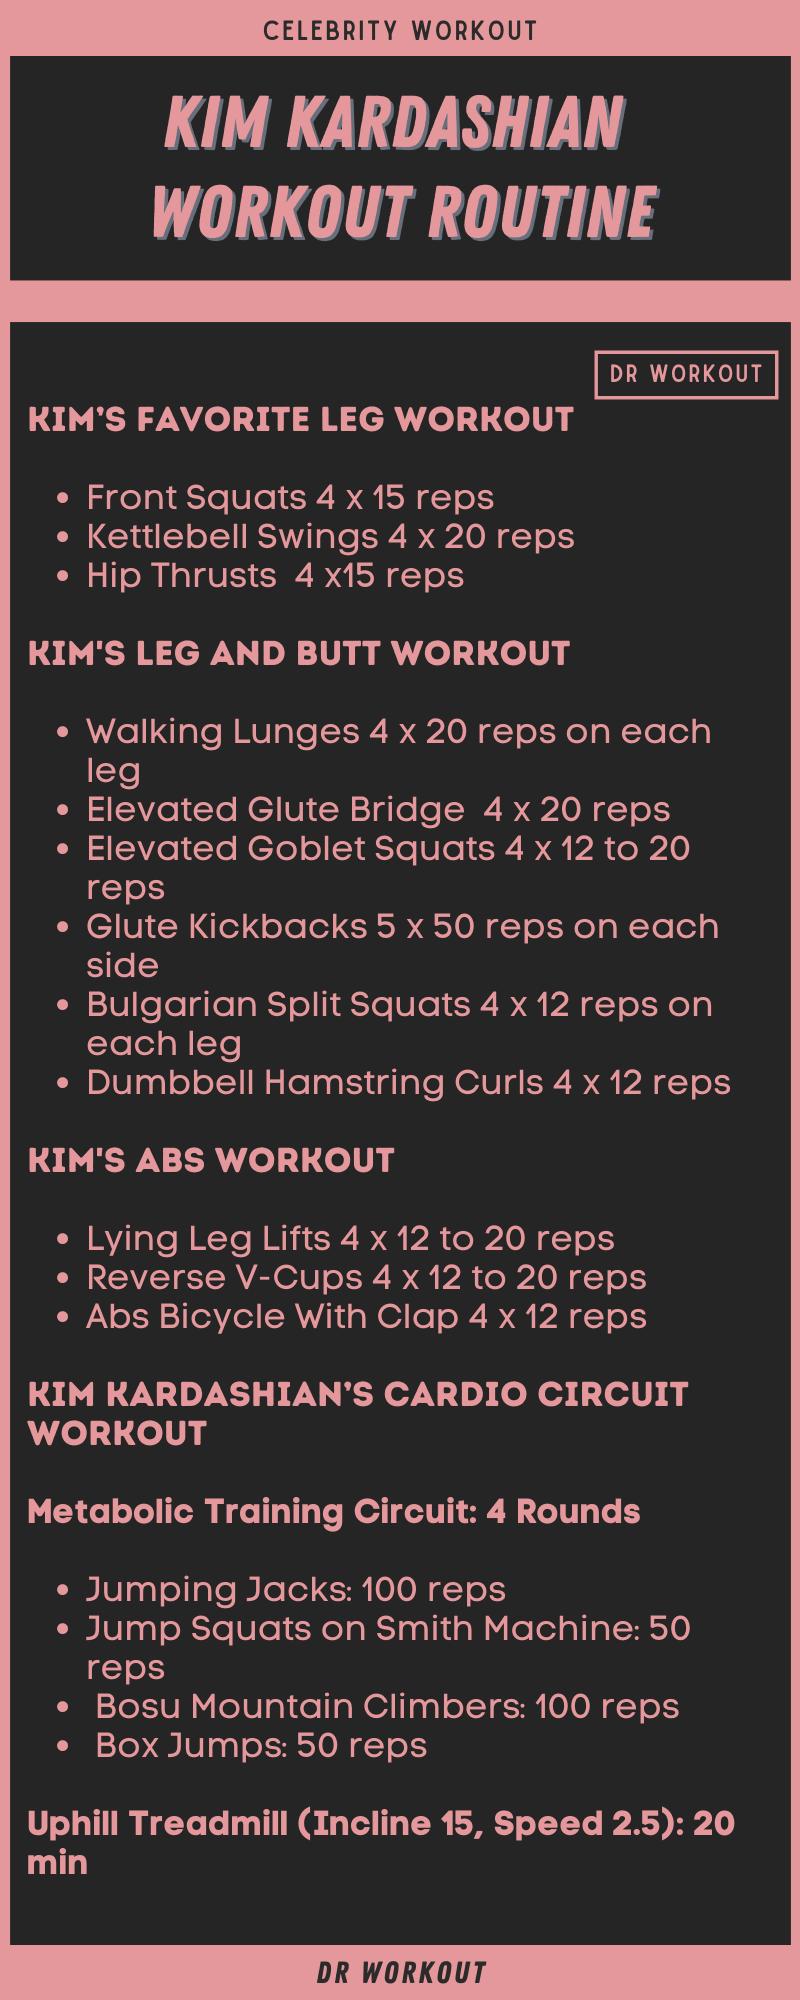 Kim Kardashian Workout Routine